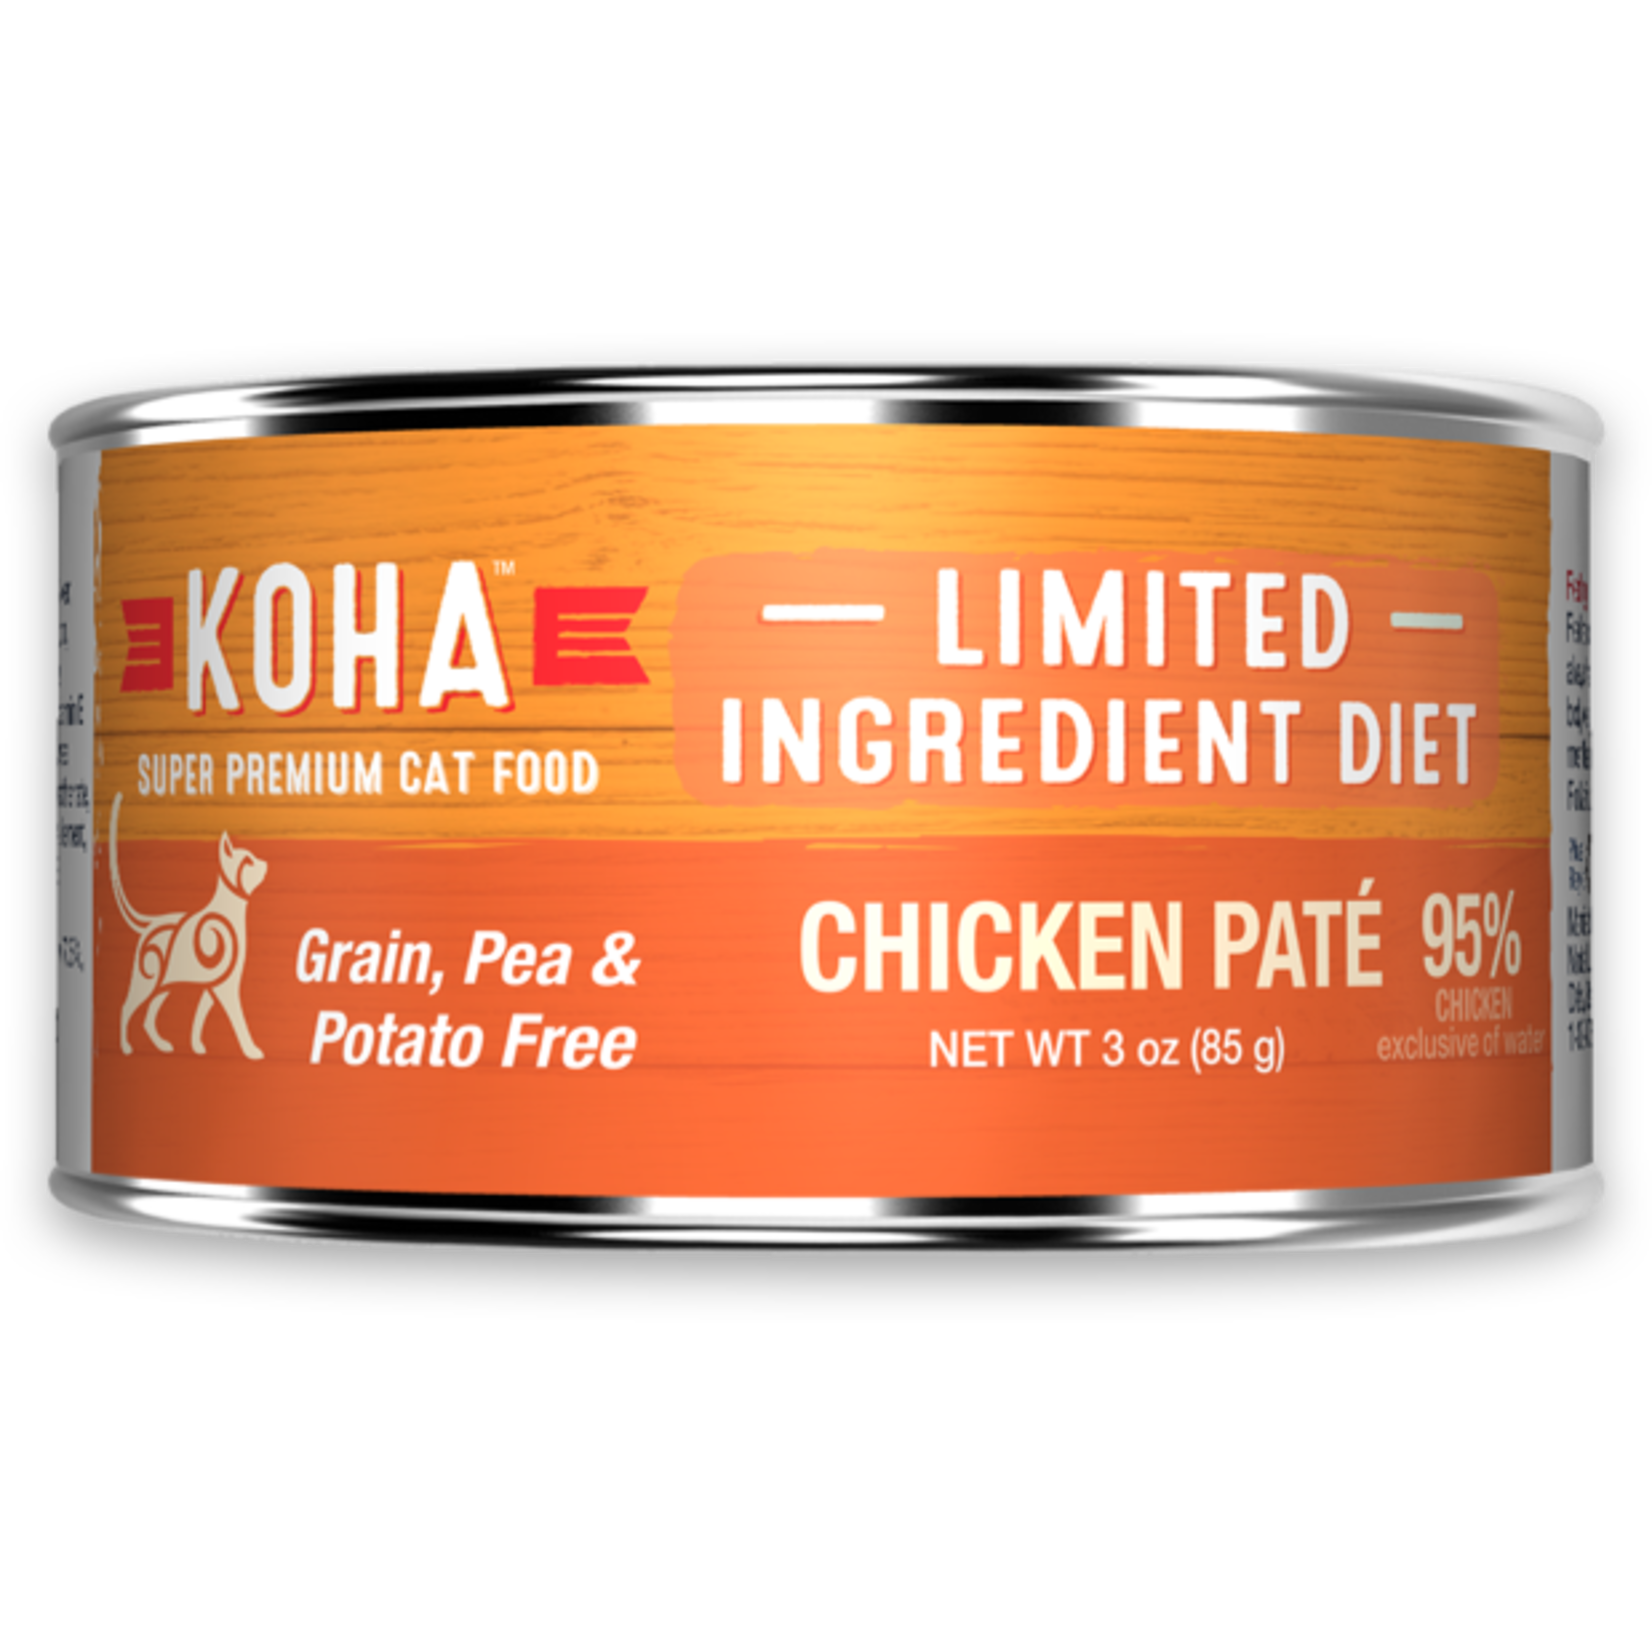 Koha KOHA Limited Ingredient Diet Chicken Pate Canned Cat Food 3oz